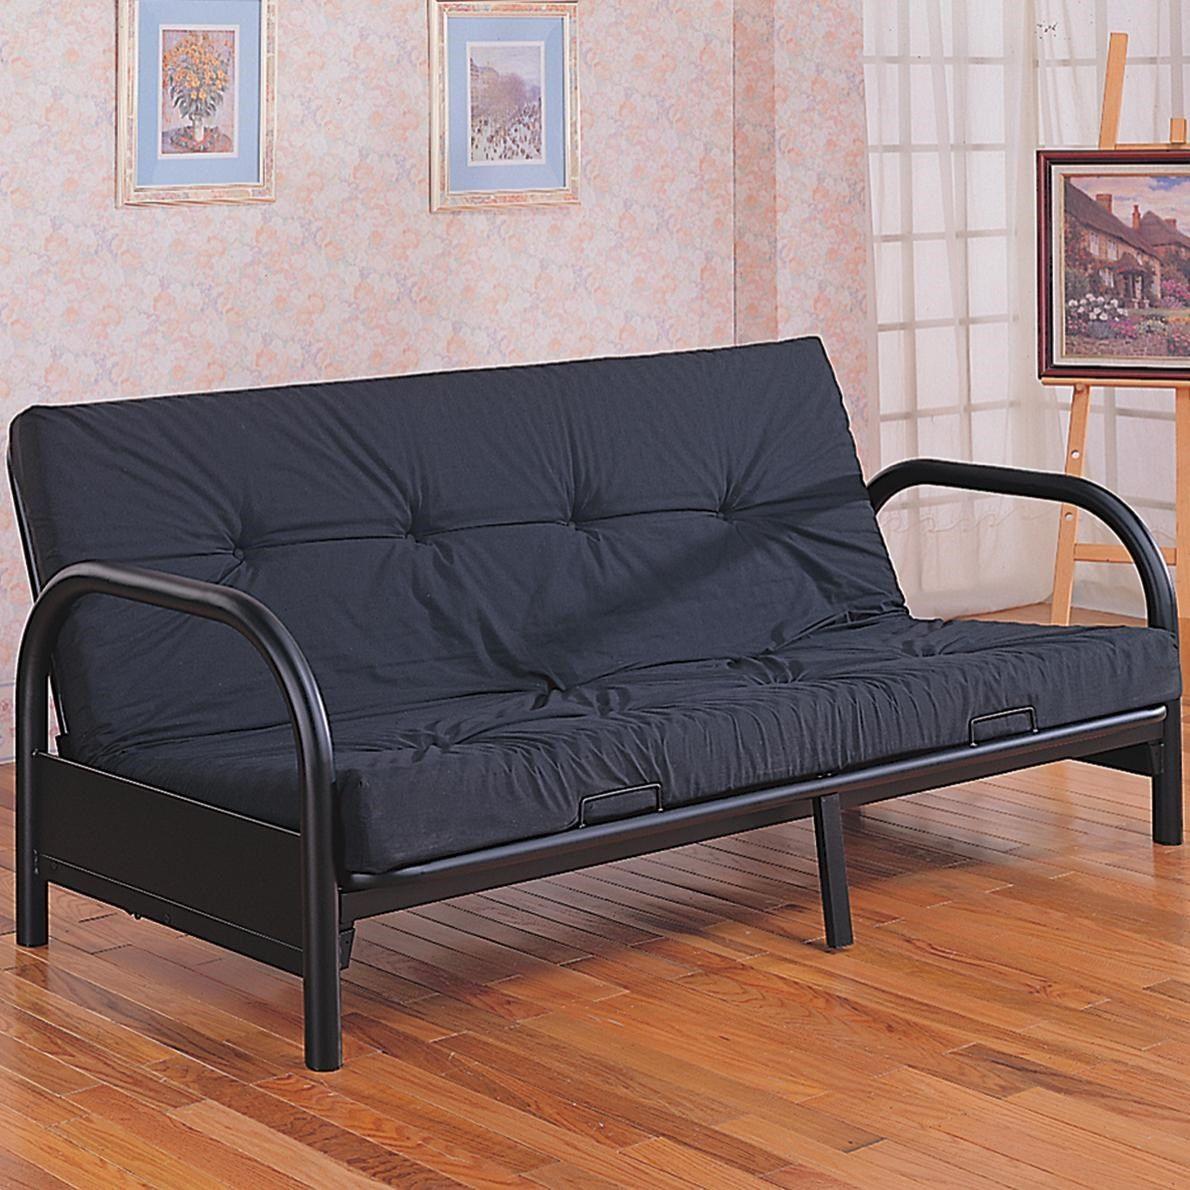 Coaster Furniture 2345 Contemporary Metal Frame Futon